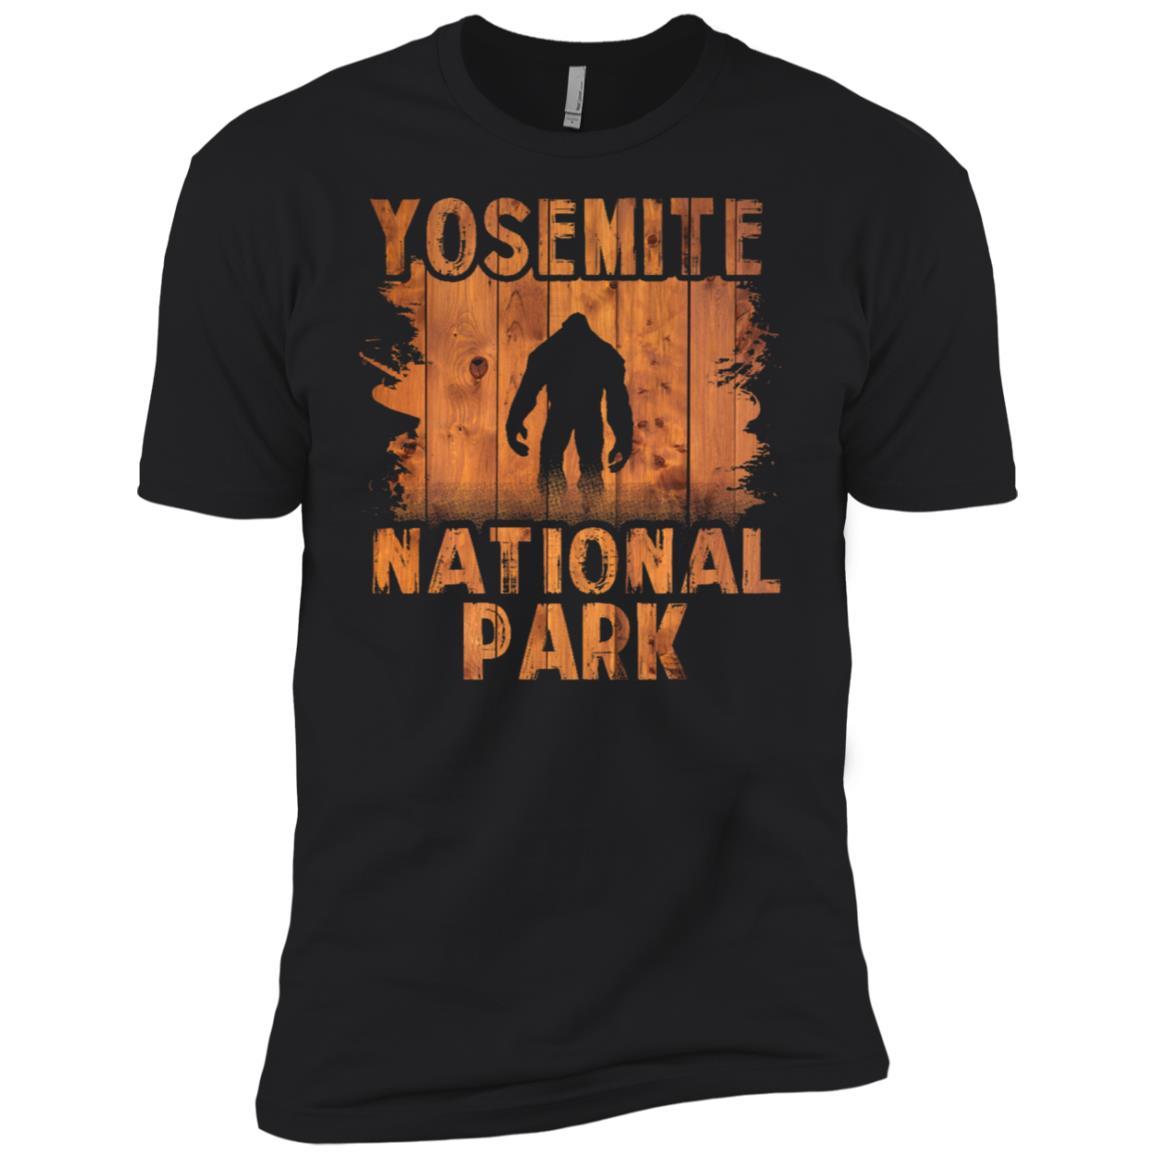 Yosemite National Park Bigfoot California Men Short Sleeve T-Shirt